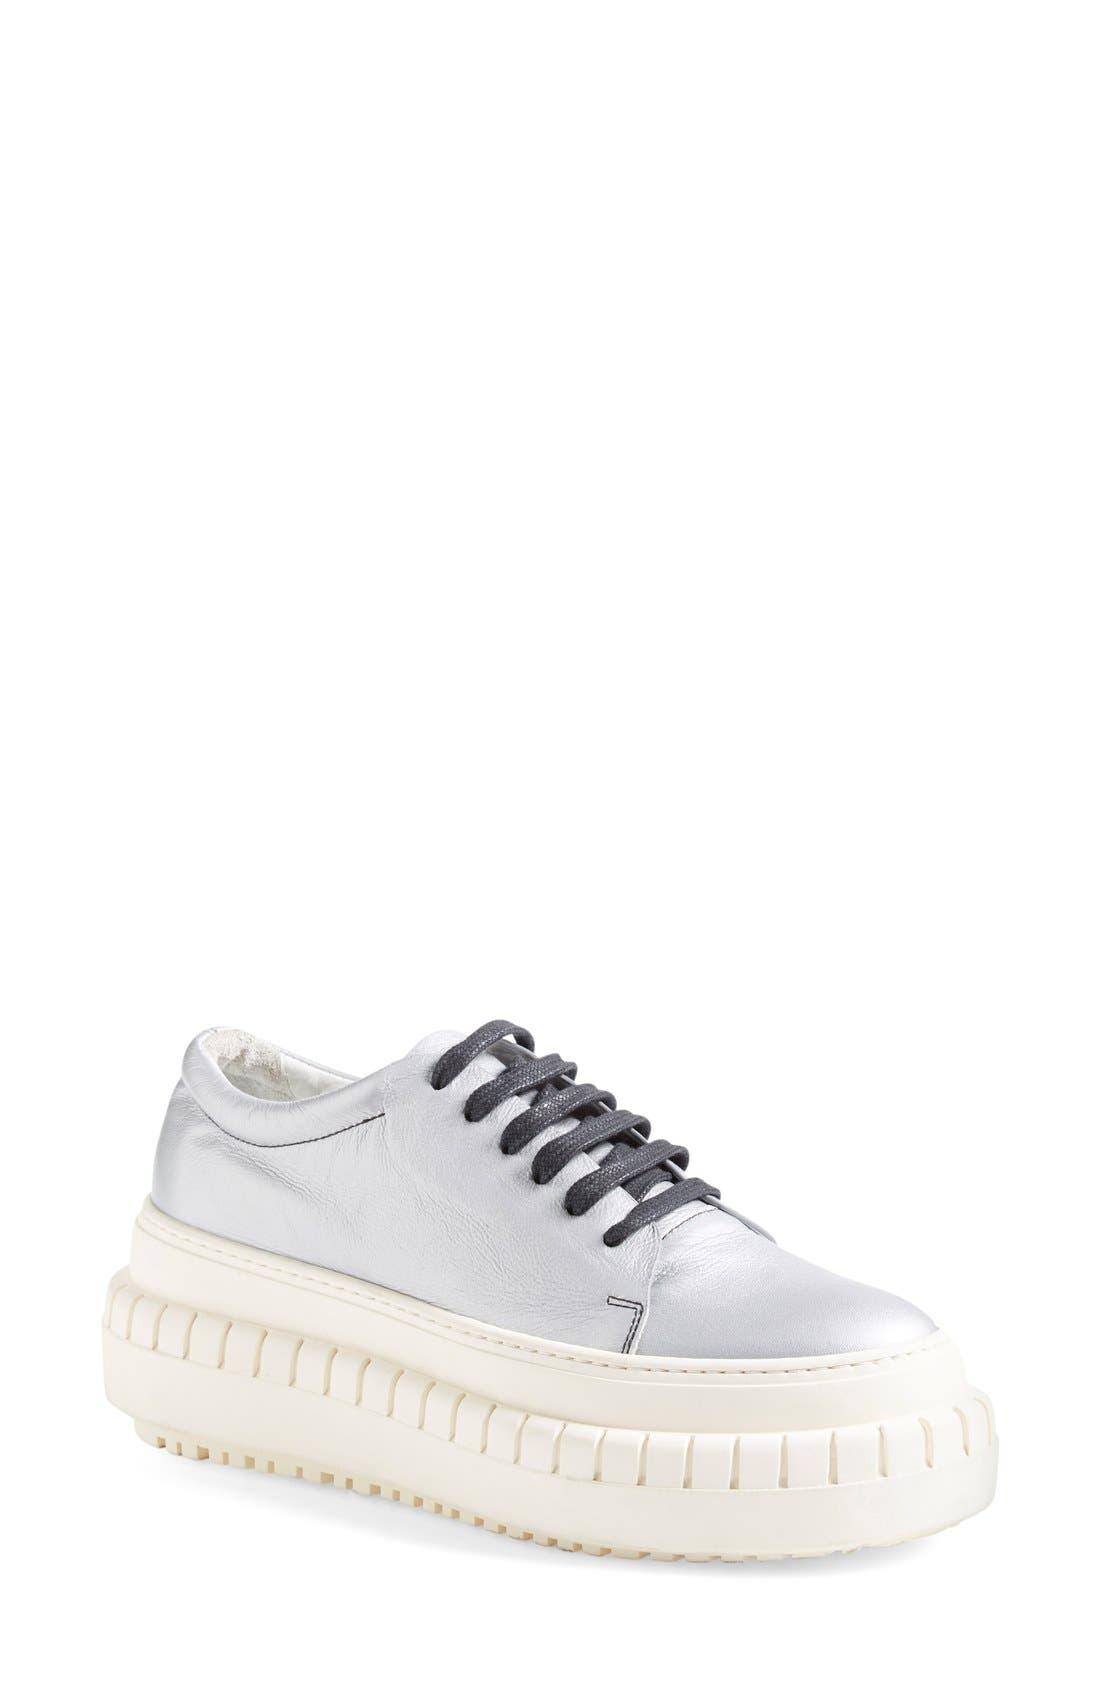 ACNE STUDIOS,                             ACNE Studio 'Saddy' Platform Sneaker,                             Main thumbnail 1, color,                             040